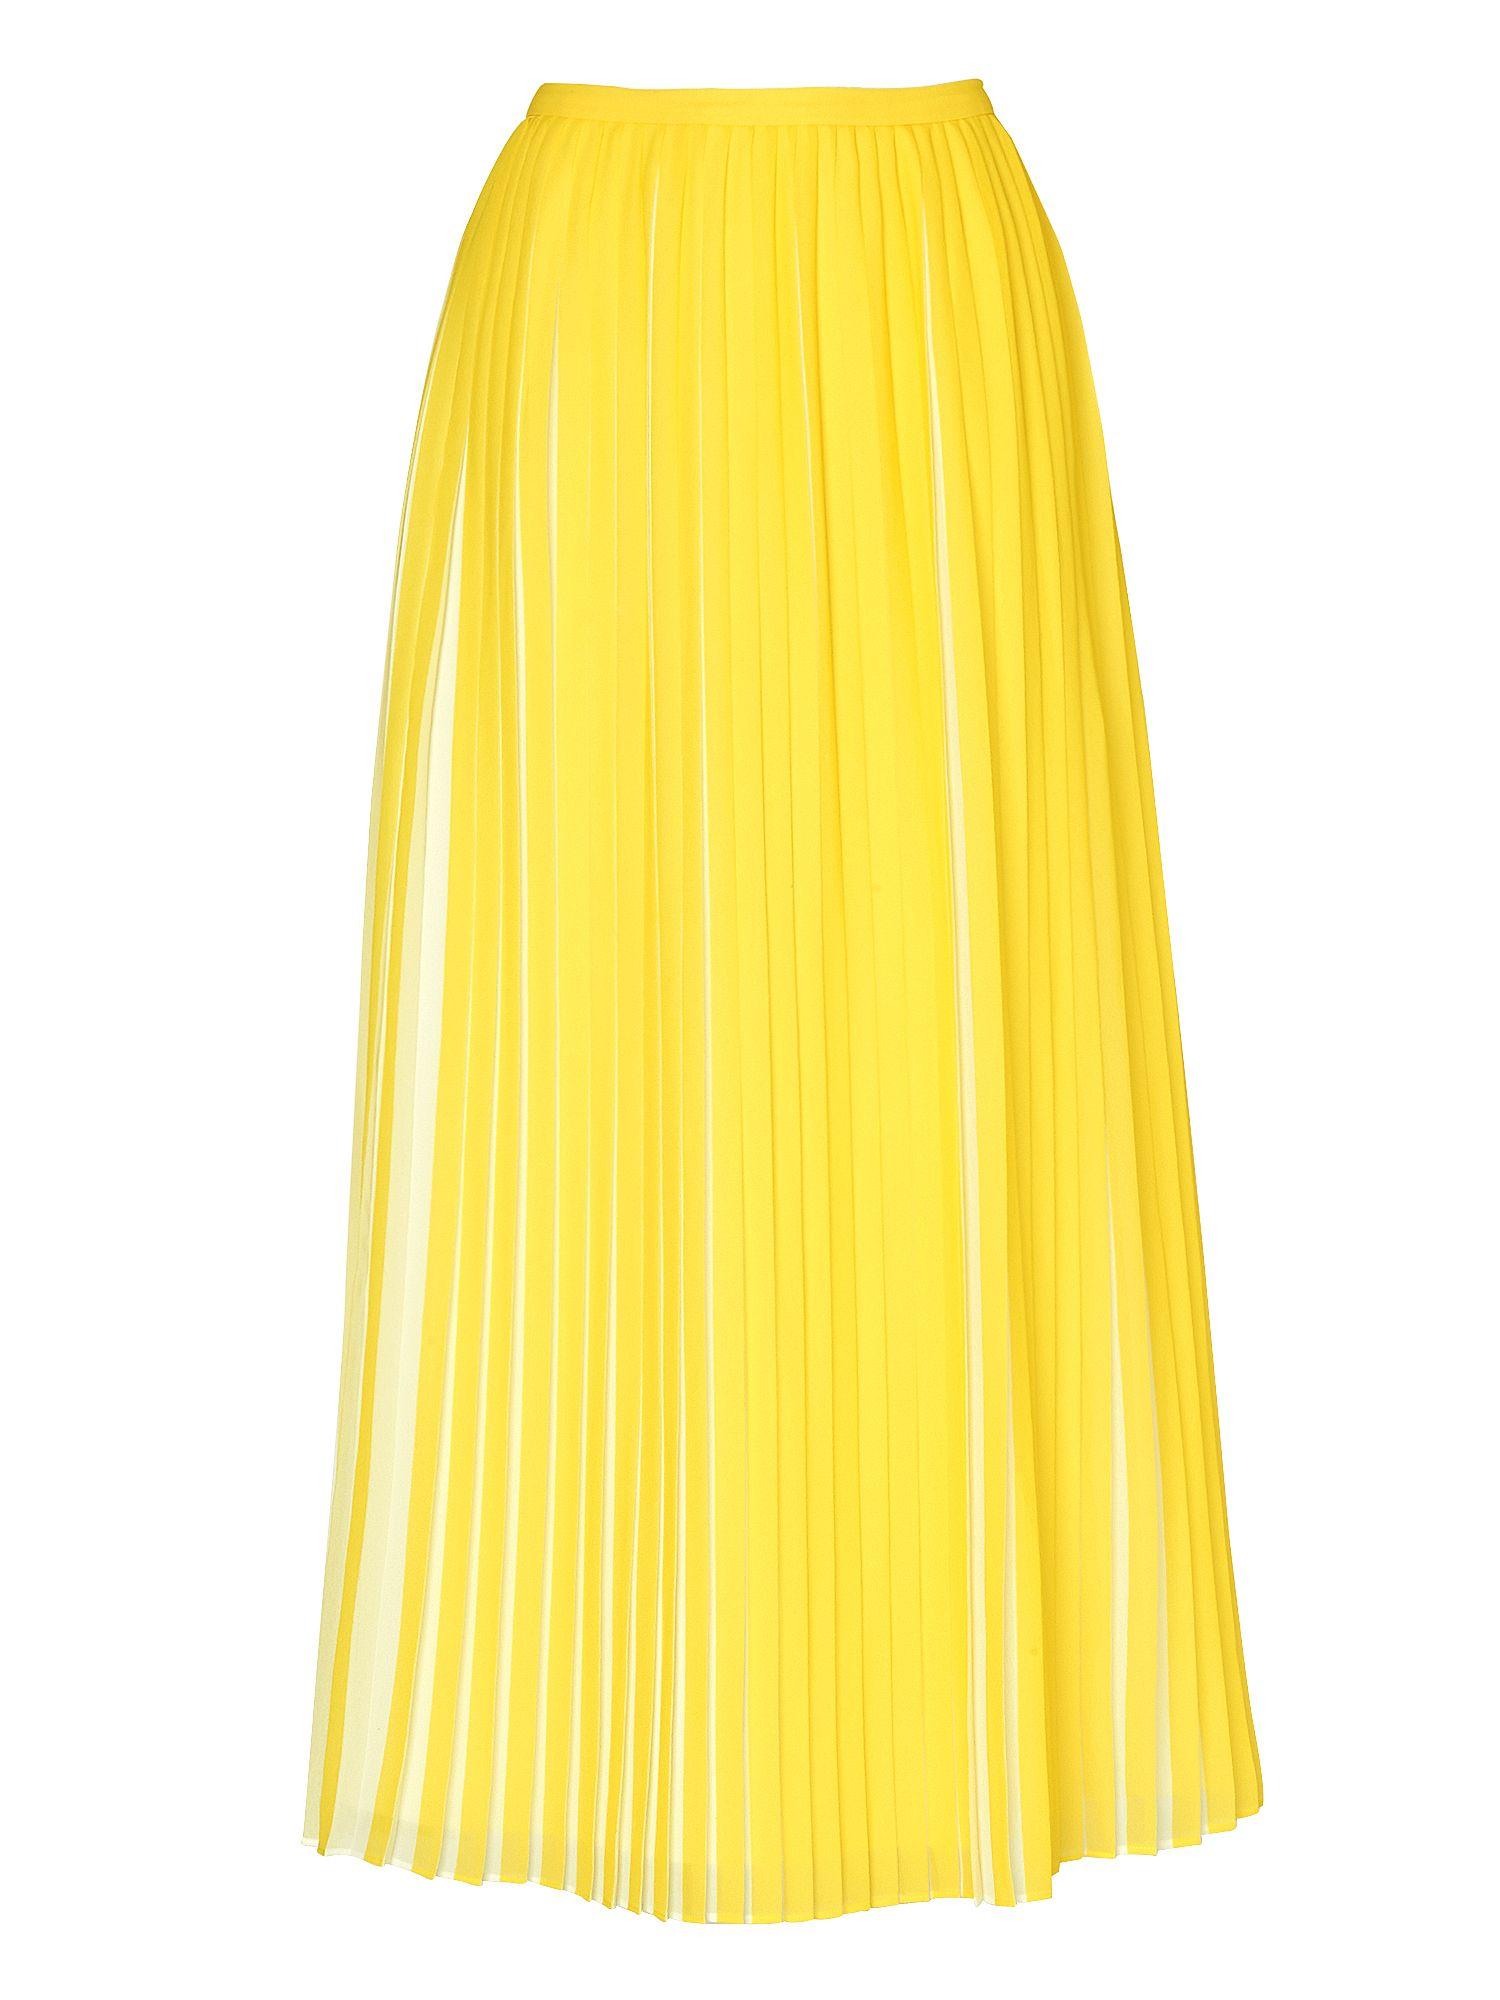 l k sasoon pleated skirt in yellow lyst